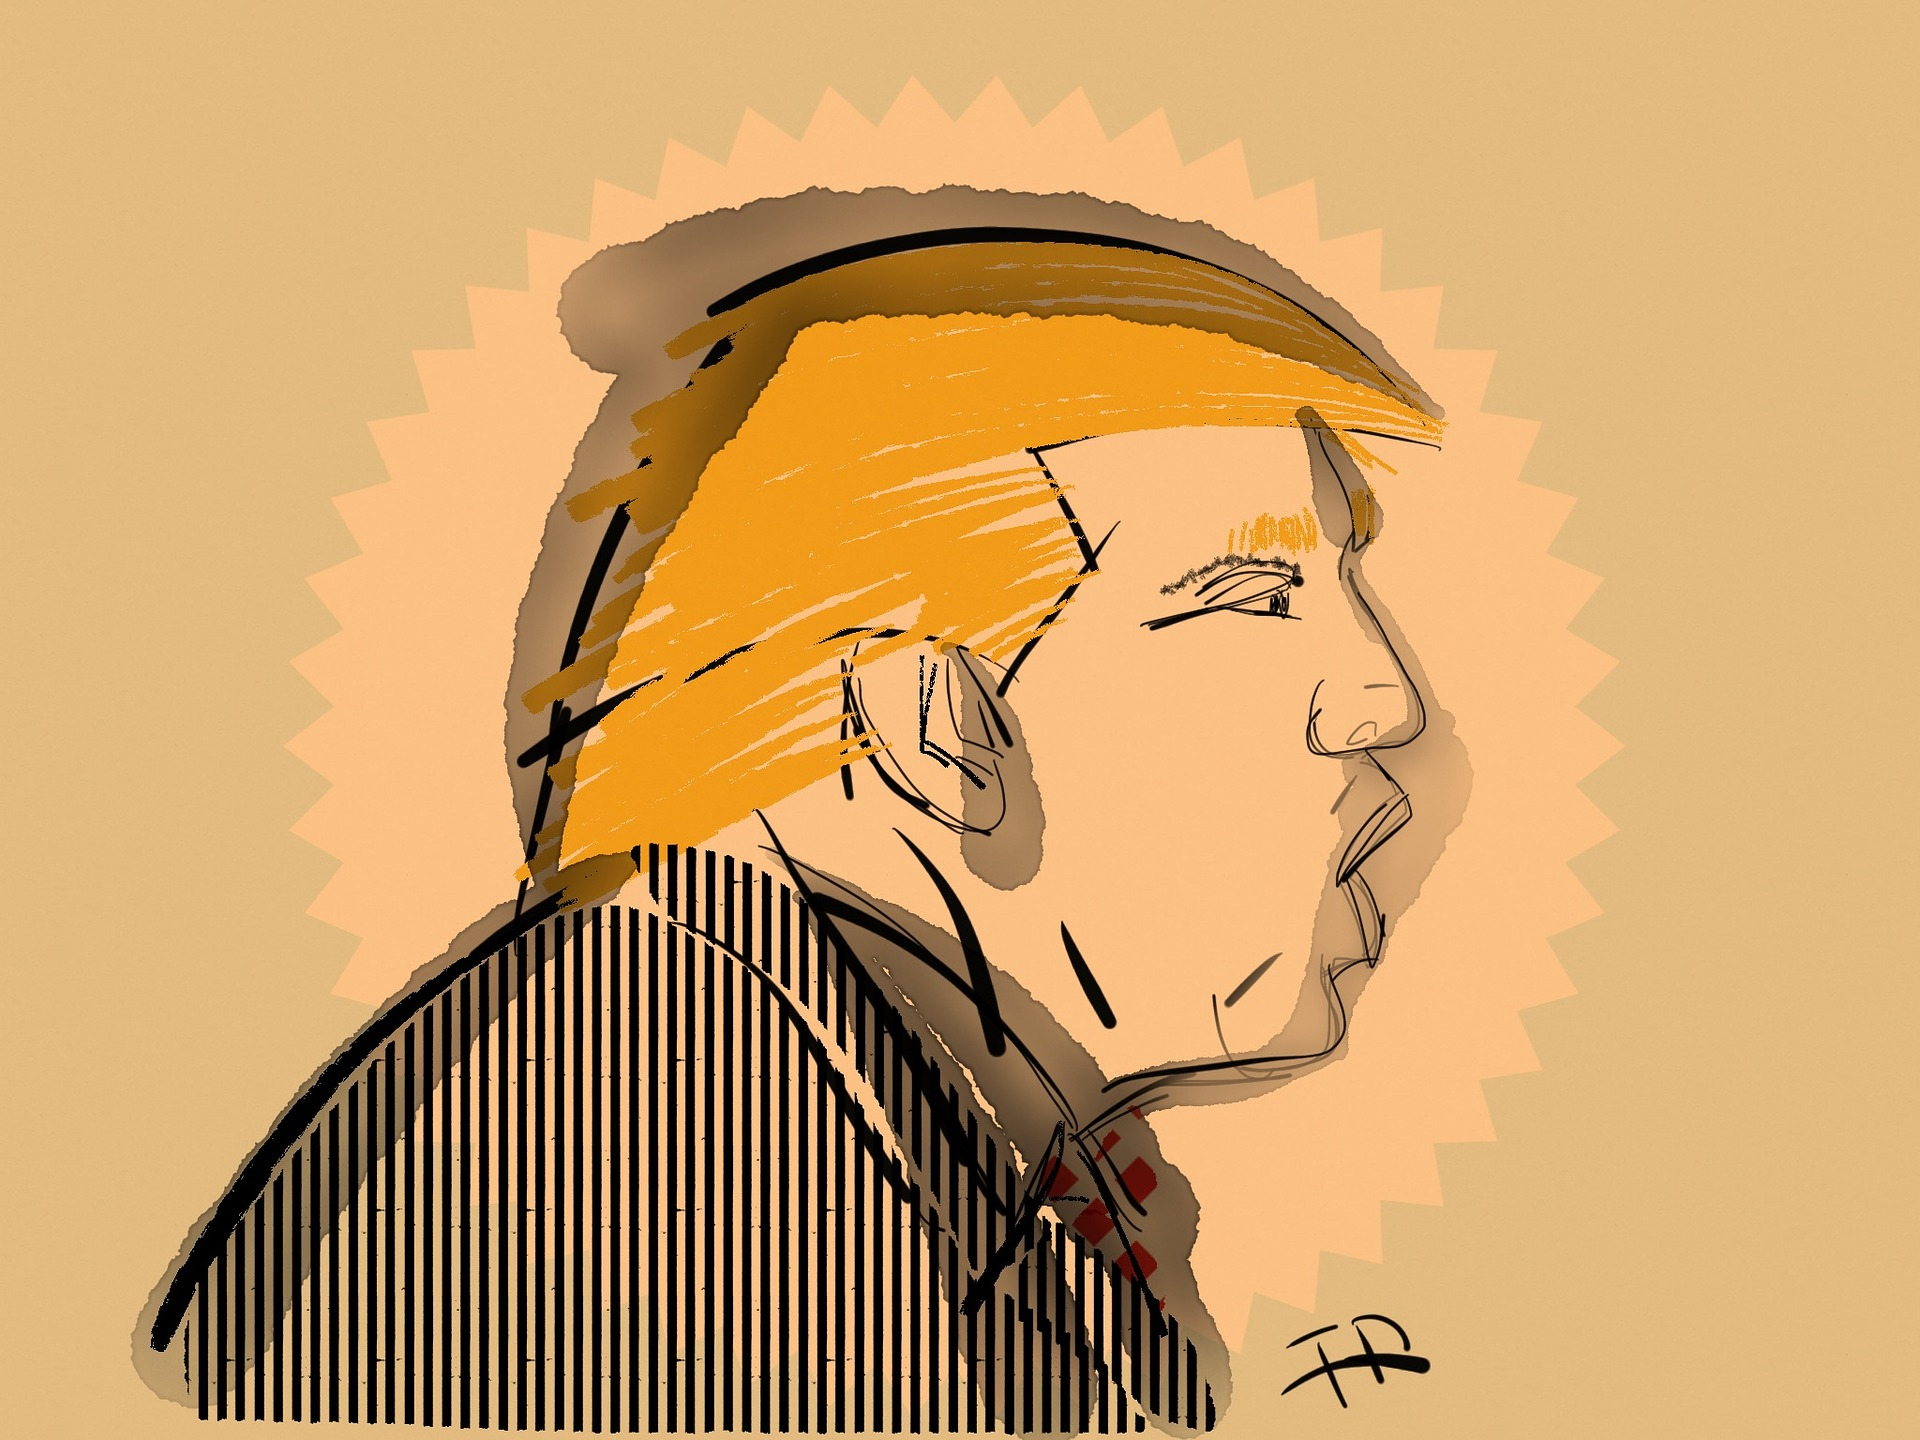 trump-1843504_1920